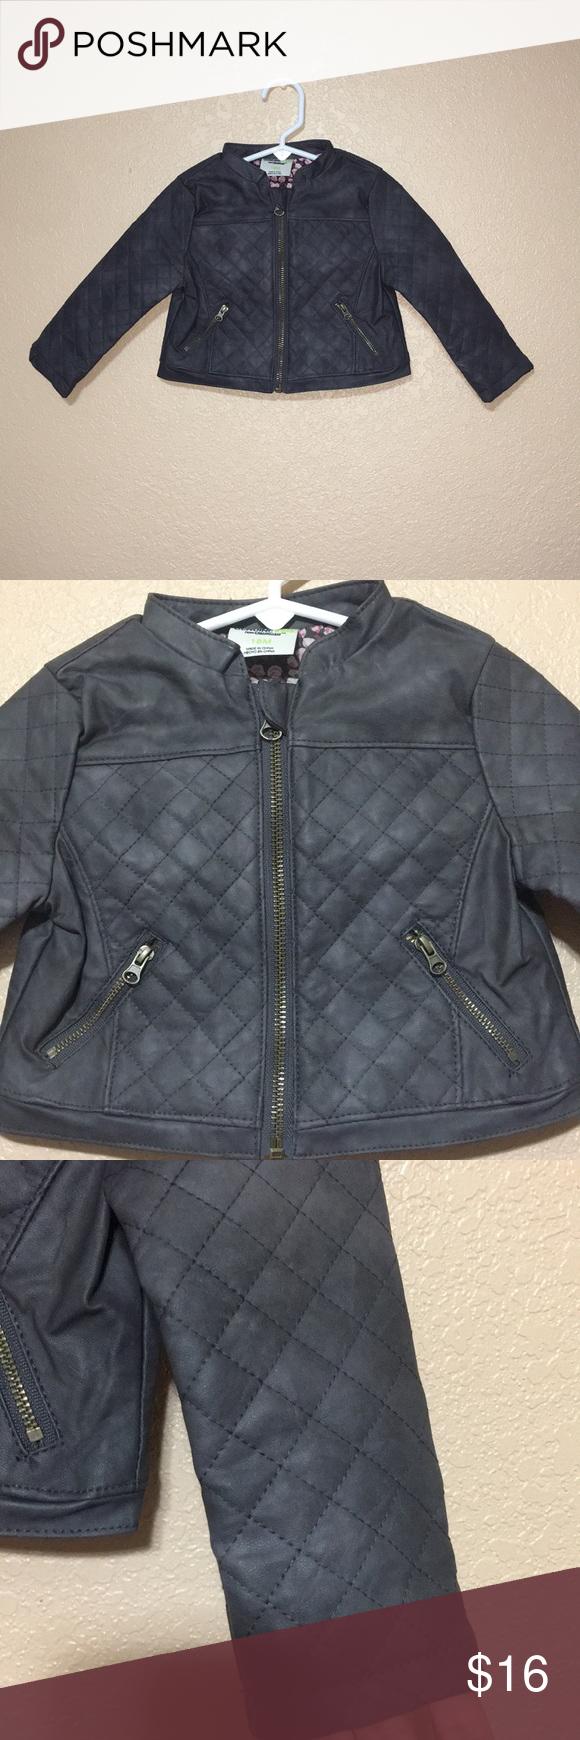 29ecda741 Genuine kids from Oshkosh quilted moto jacket 18m